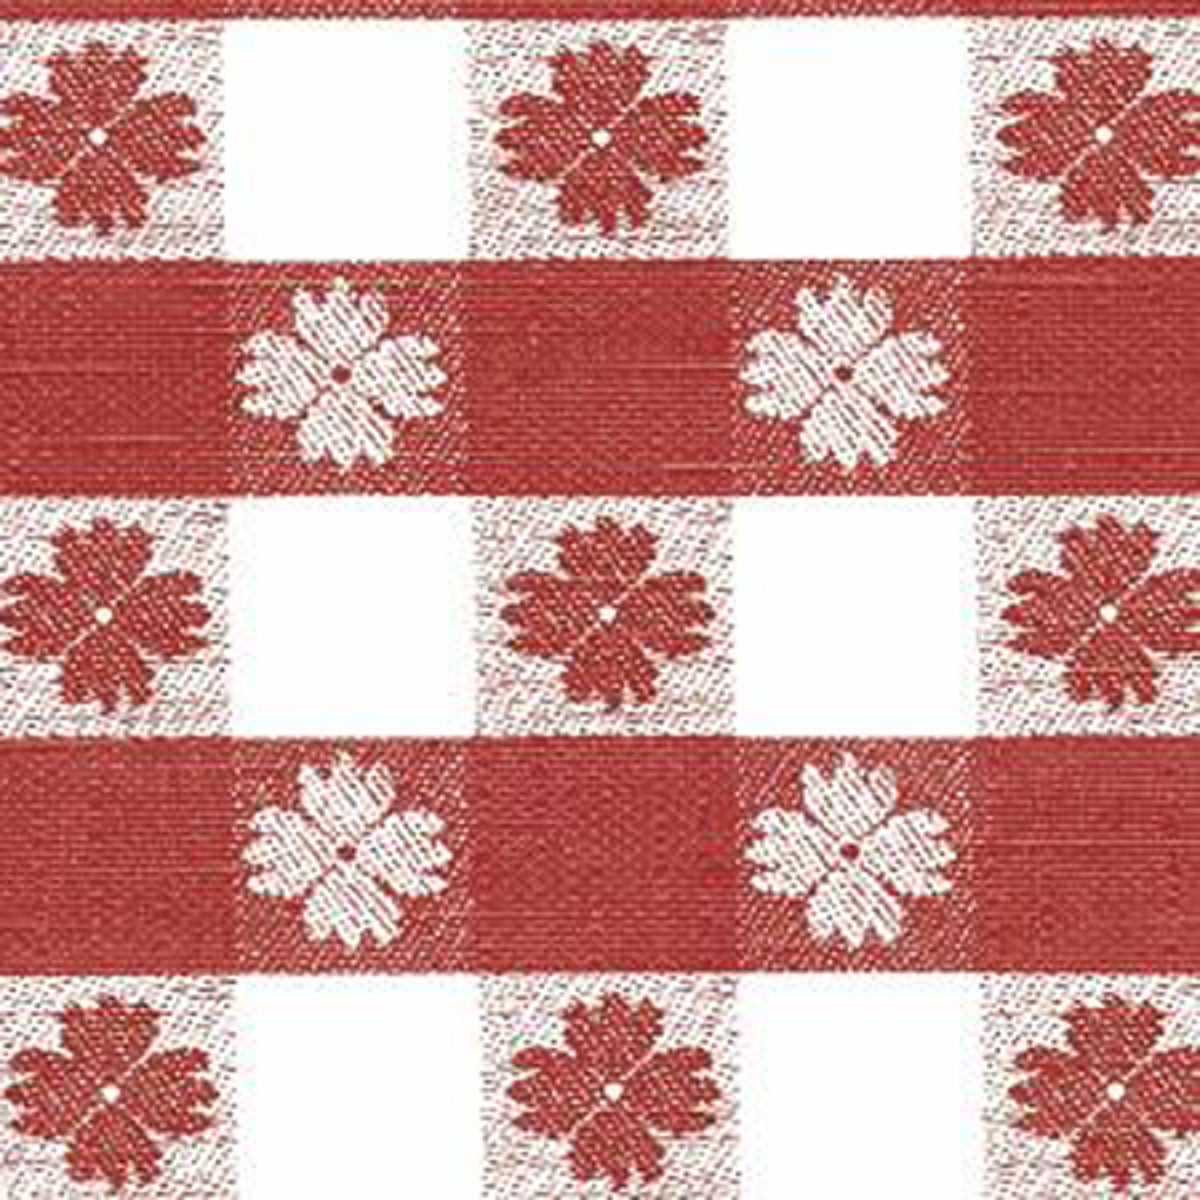 Nordic Shield Evp. RED CHECK FLN BACK VINYL 243